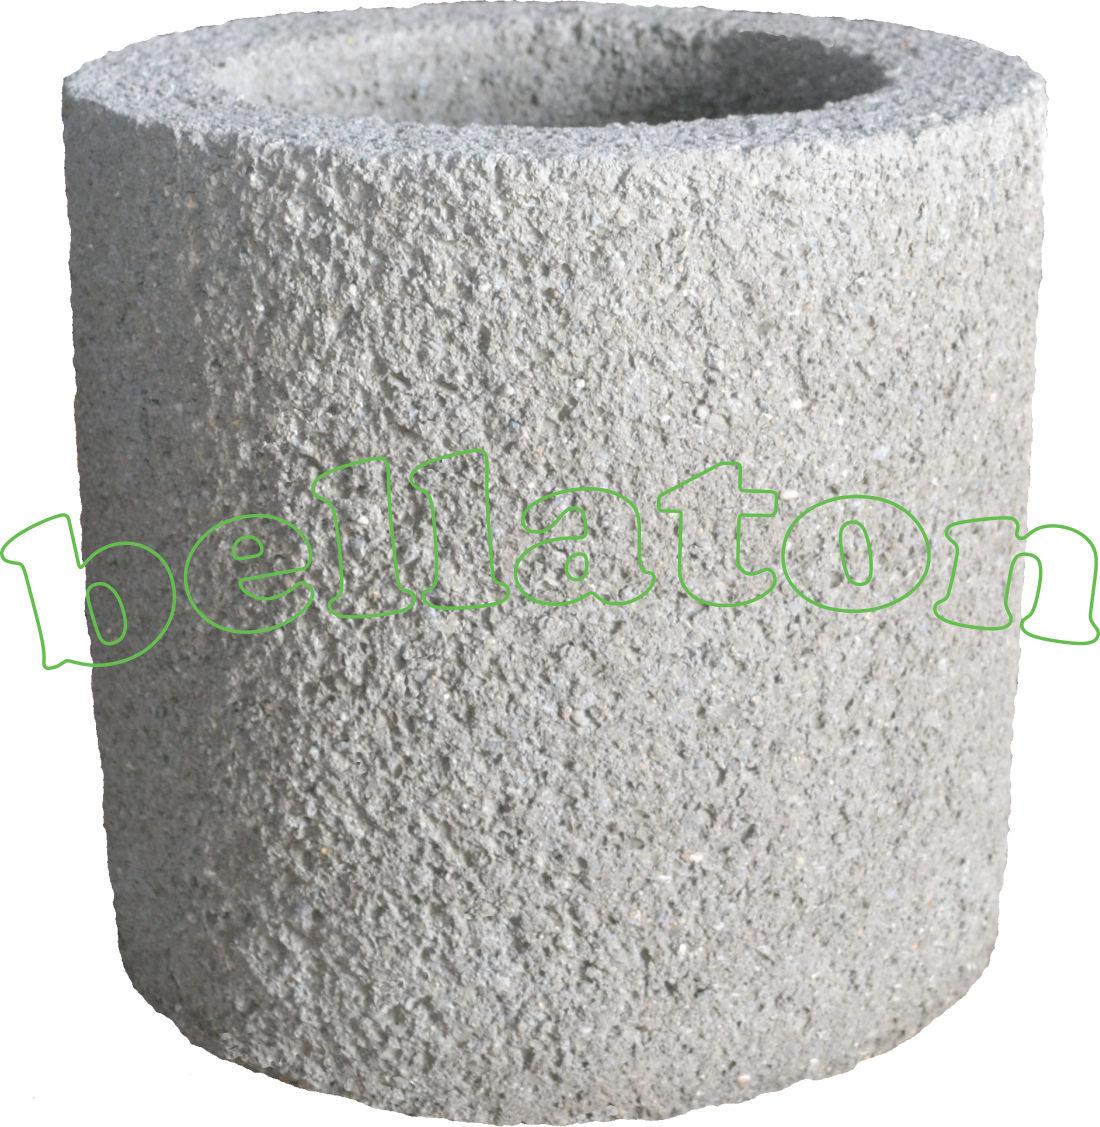 "bellaton - bellaton - blumentrog, pflanzkübel""standard"" grau"